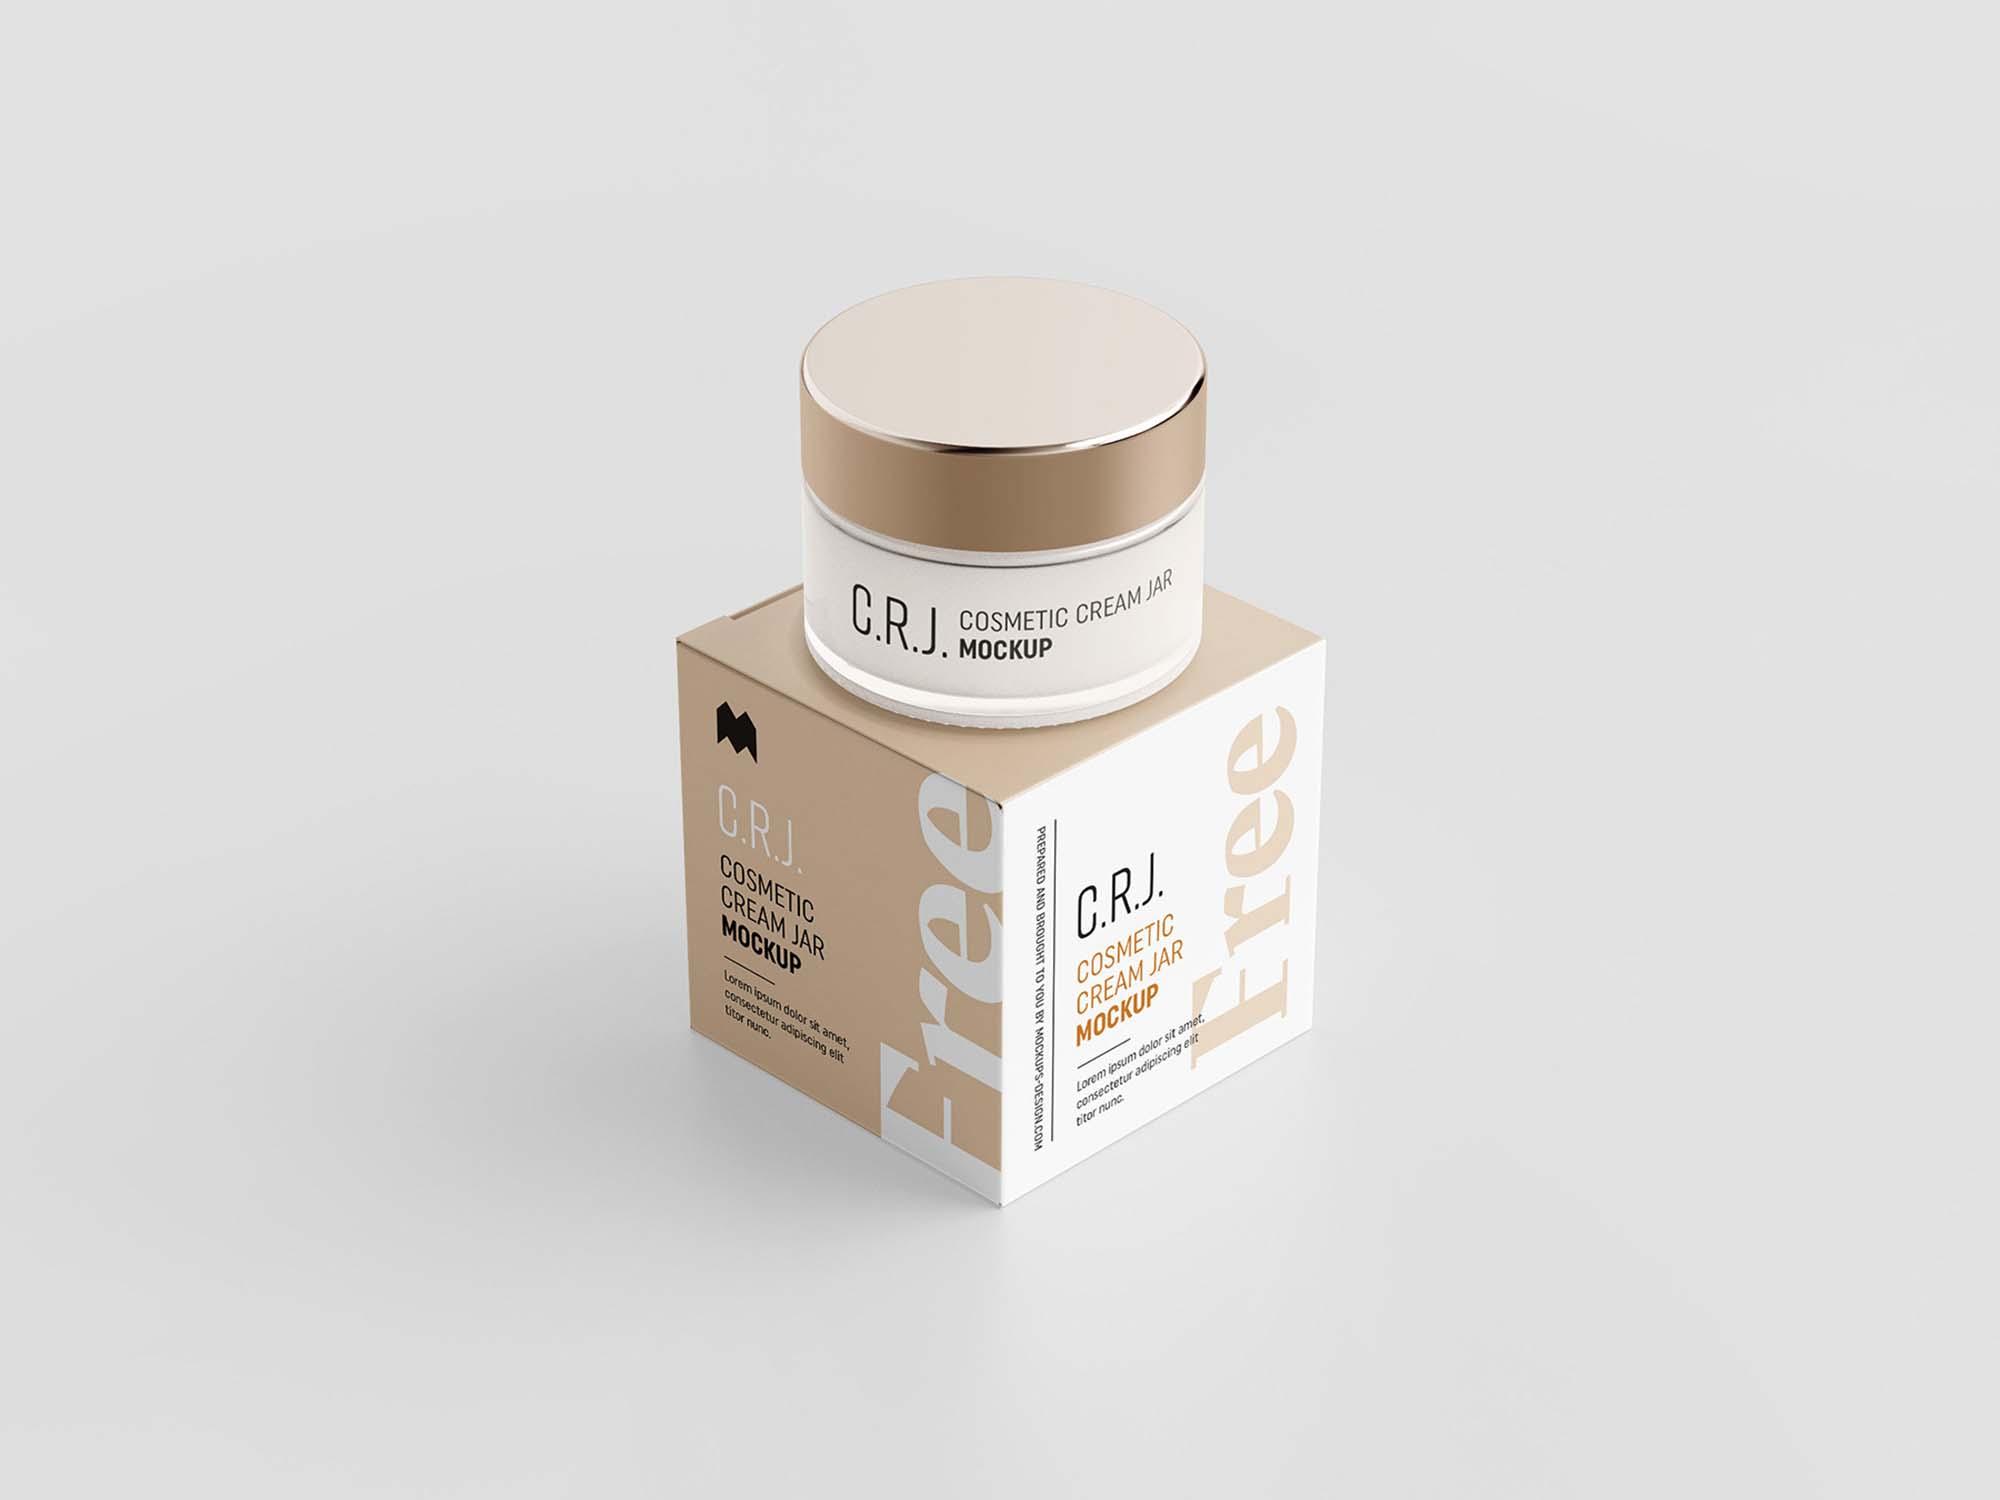 Cosmetic Box with Jar Mockup 2